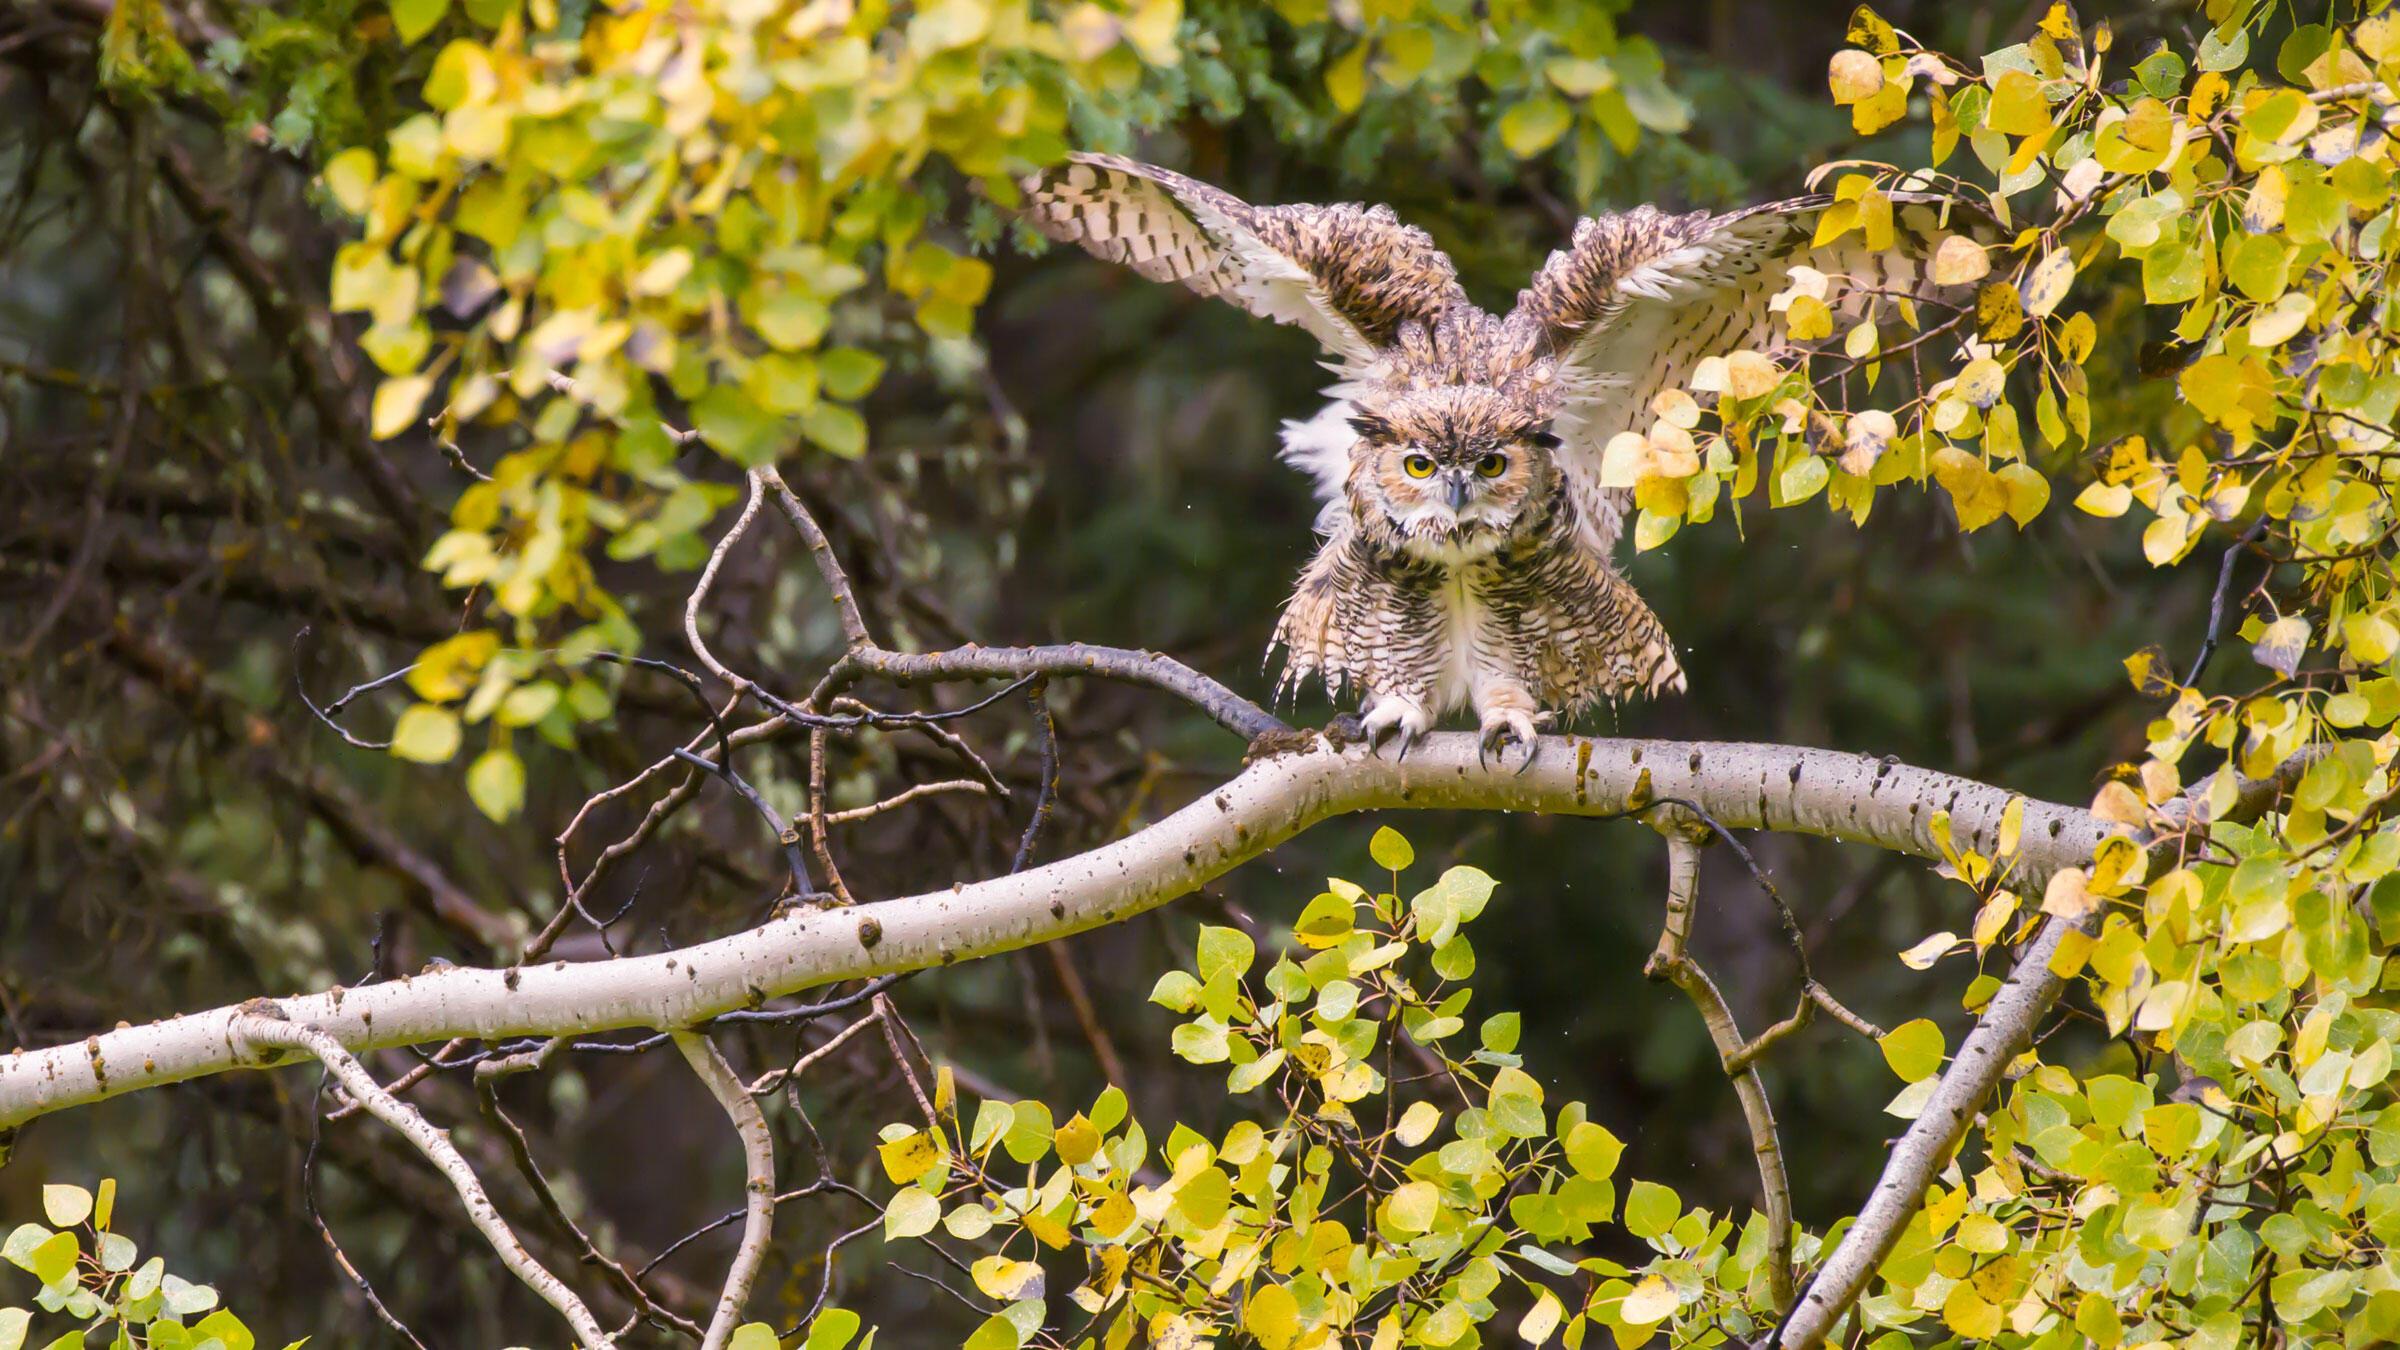 Great Horned Owl. Josh Metten/Audubon Photography Awards